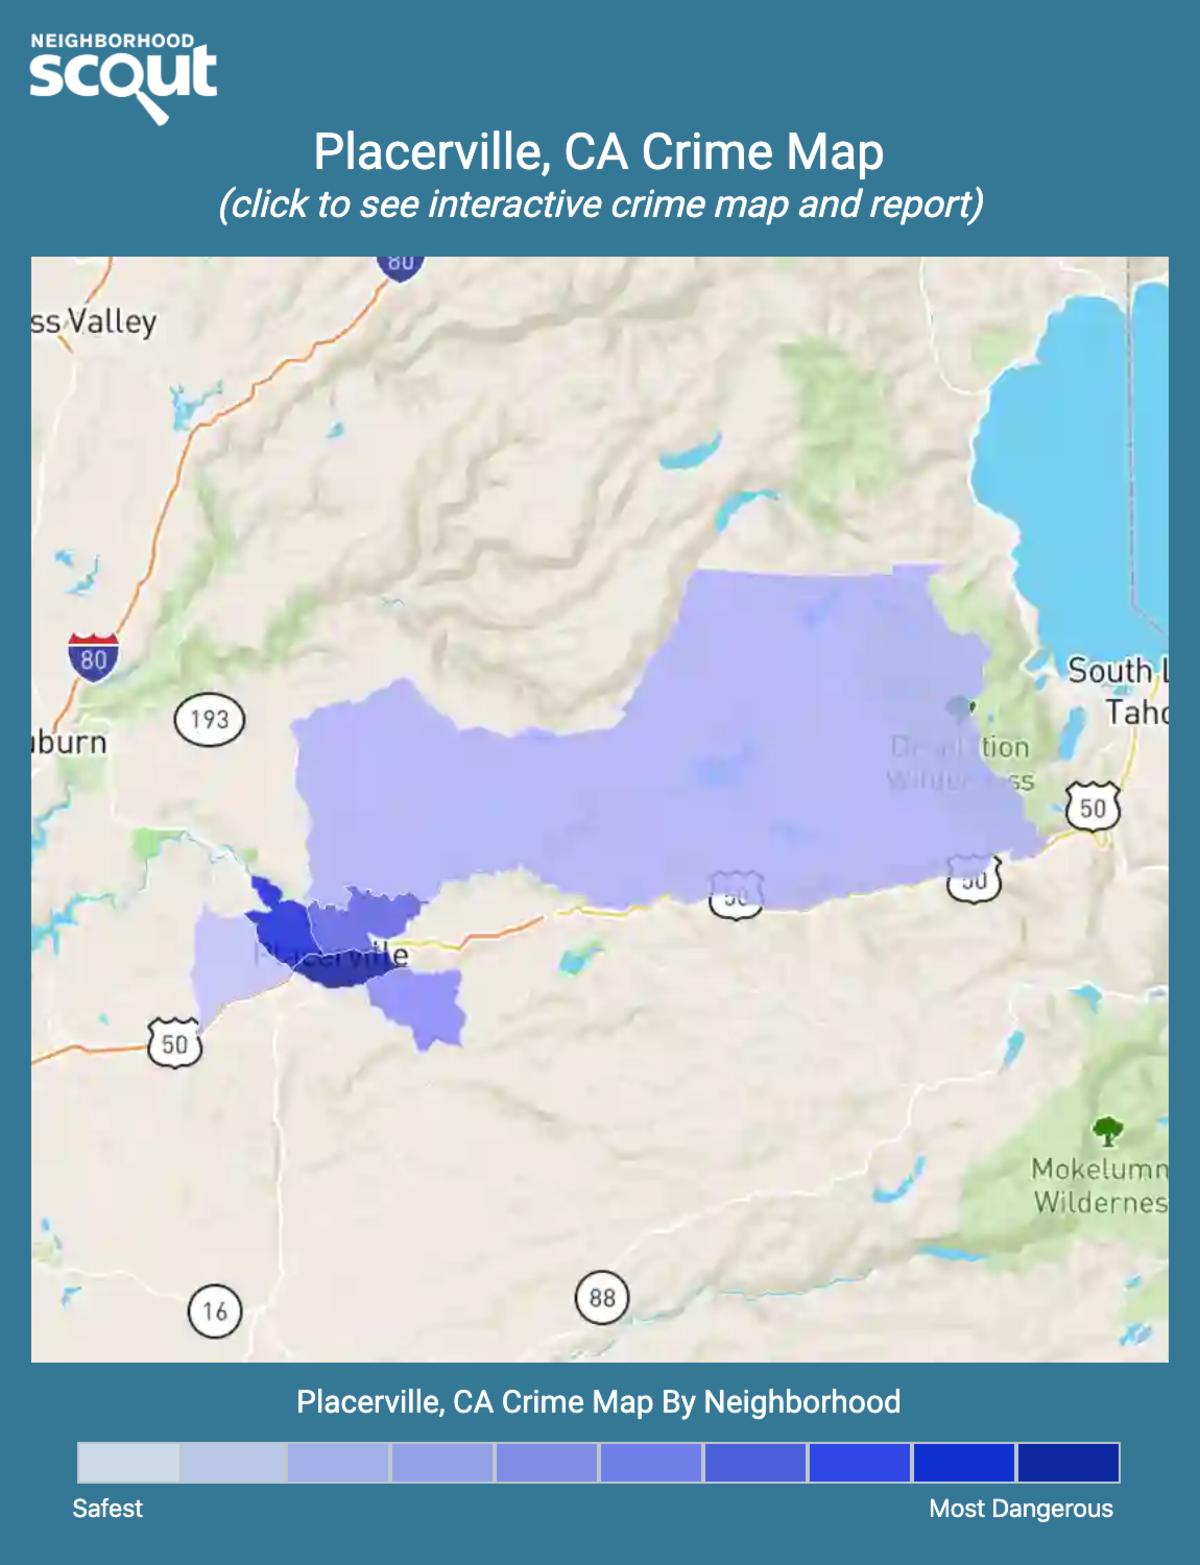 Placerville, California crime map